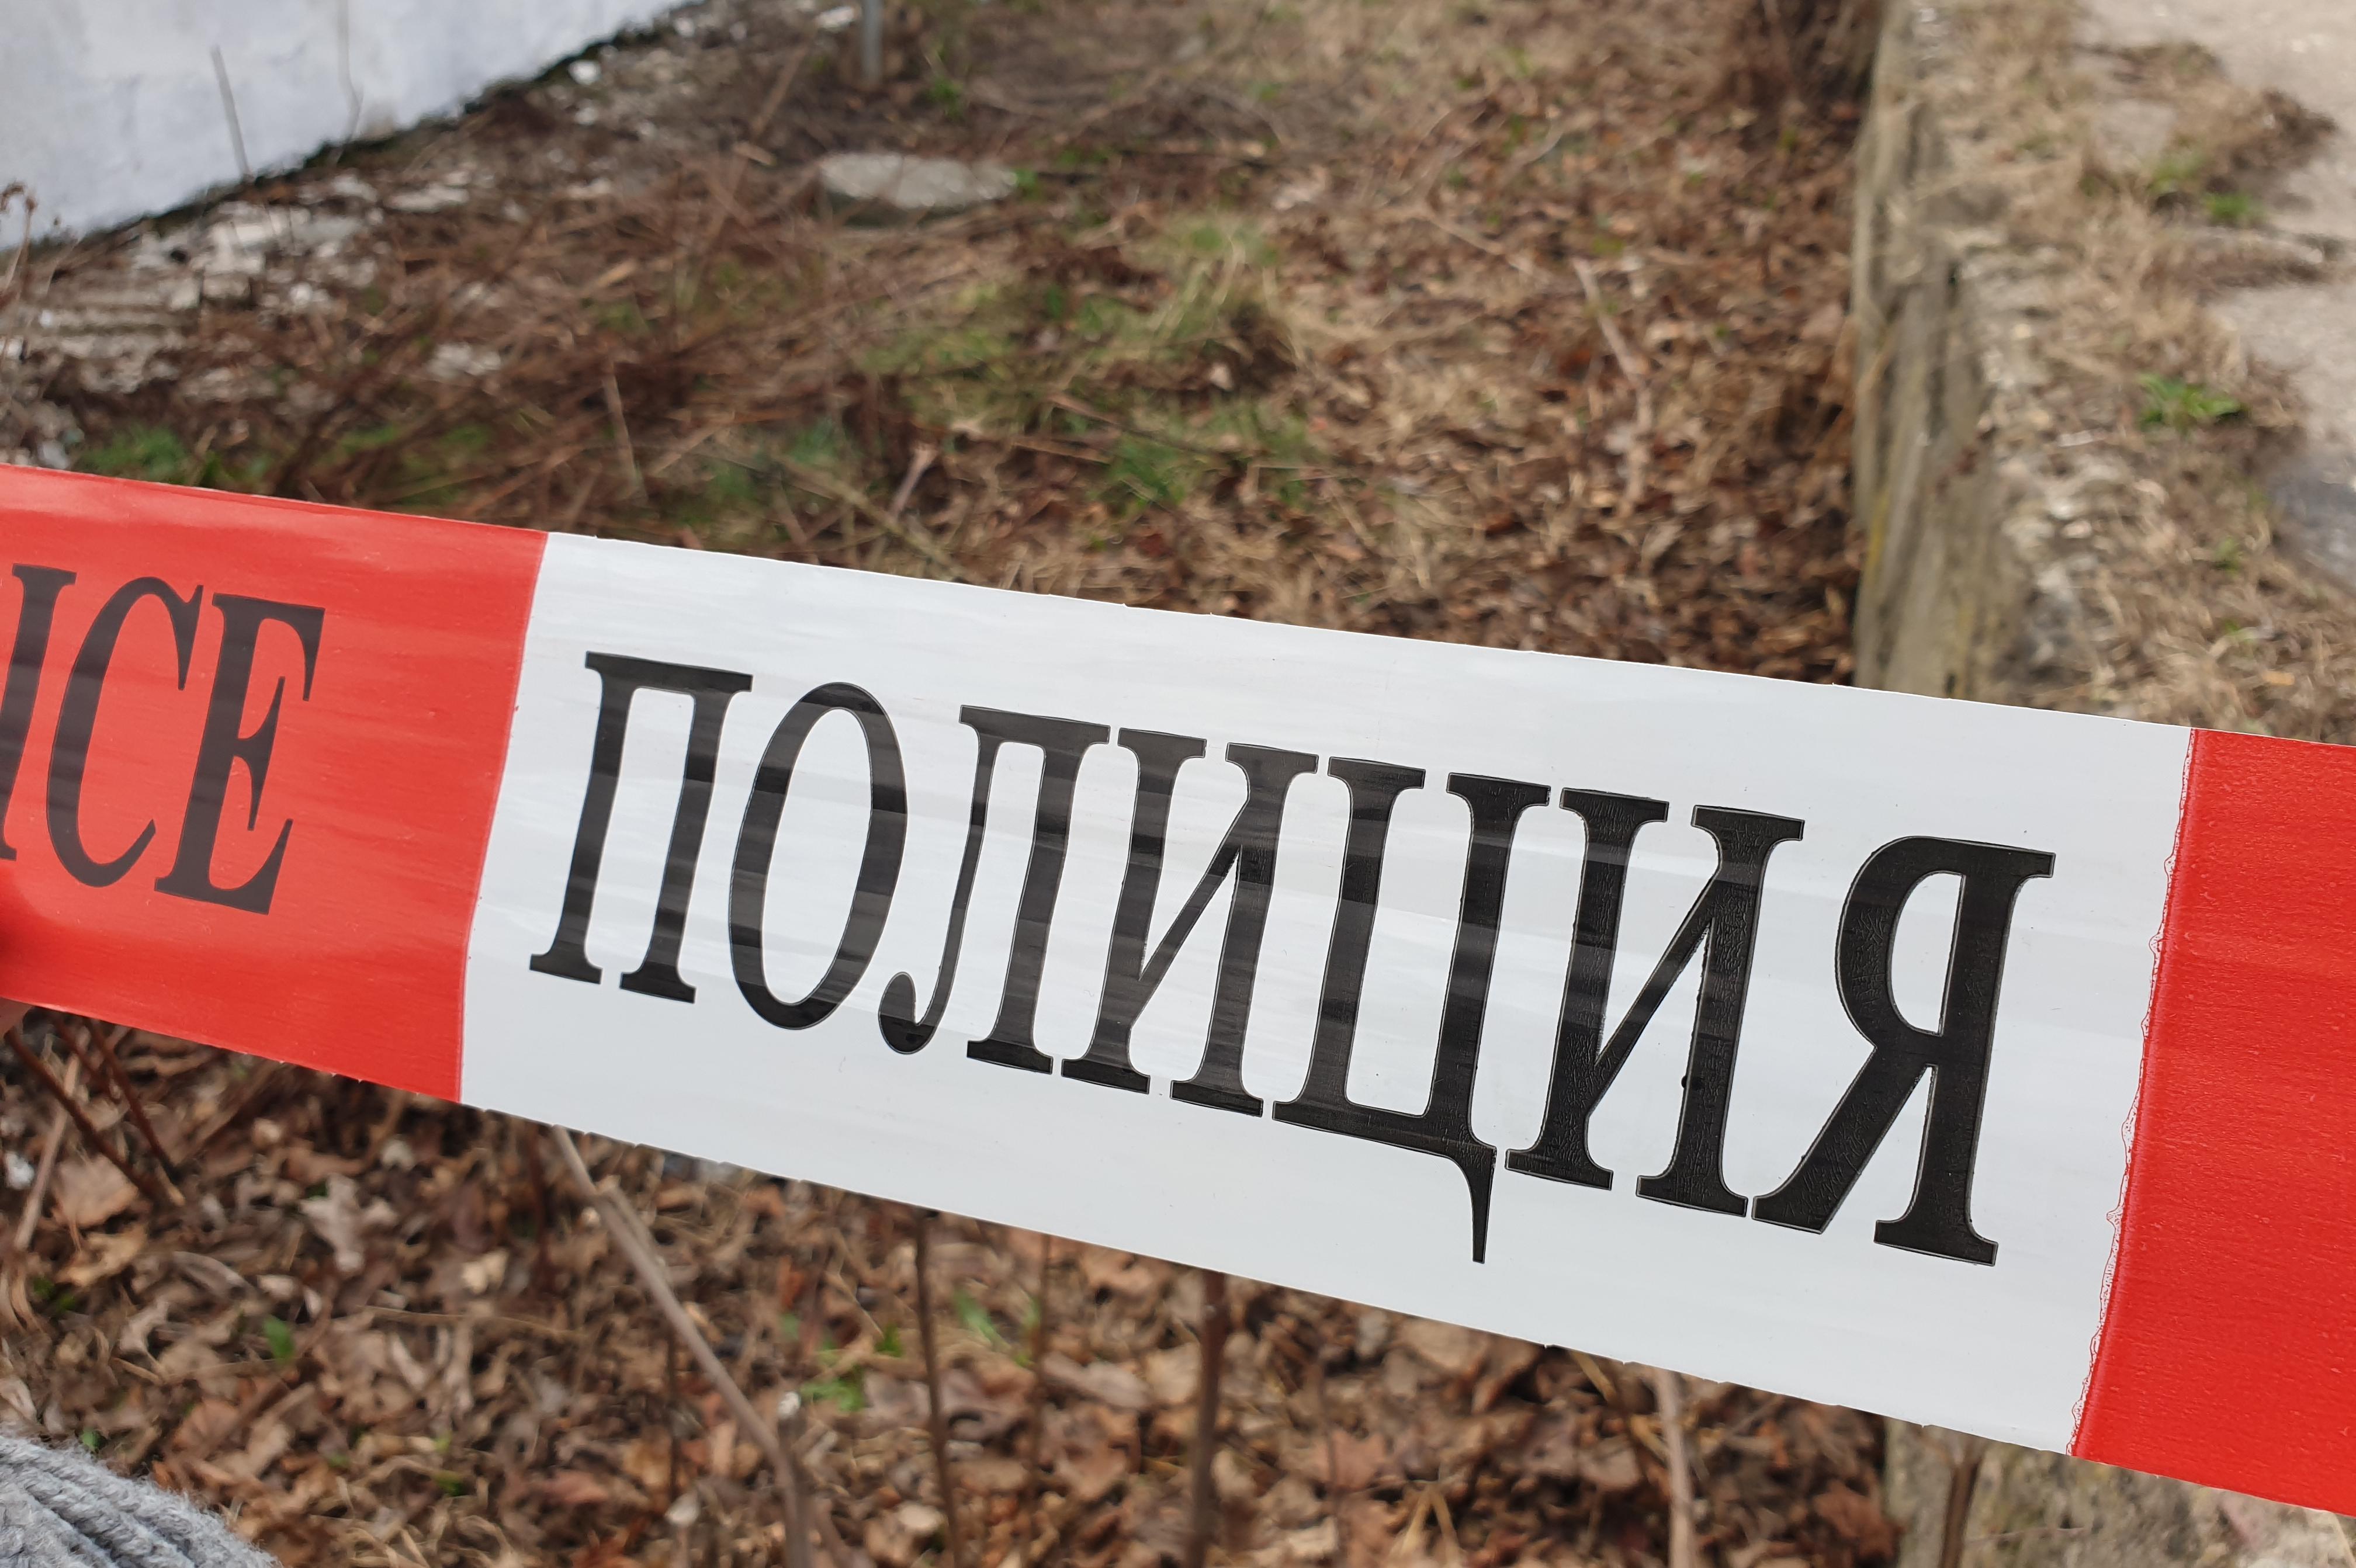 Полицаи разкриха 4 кражби в Софийска област